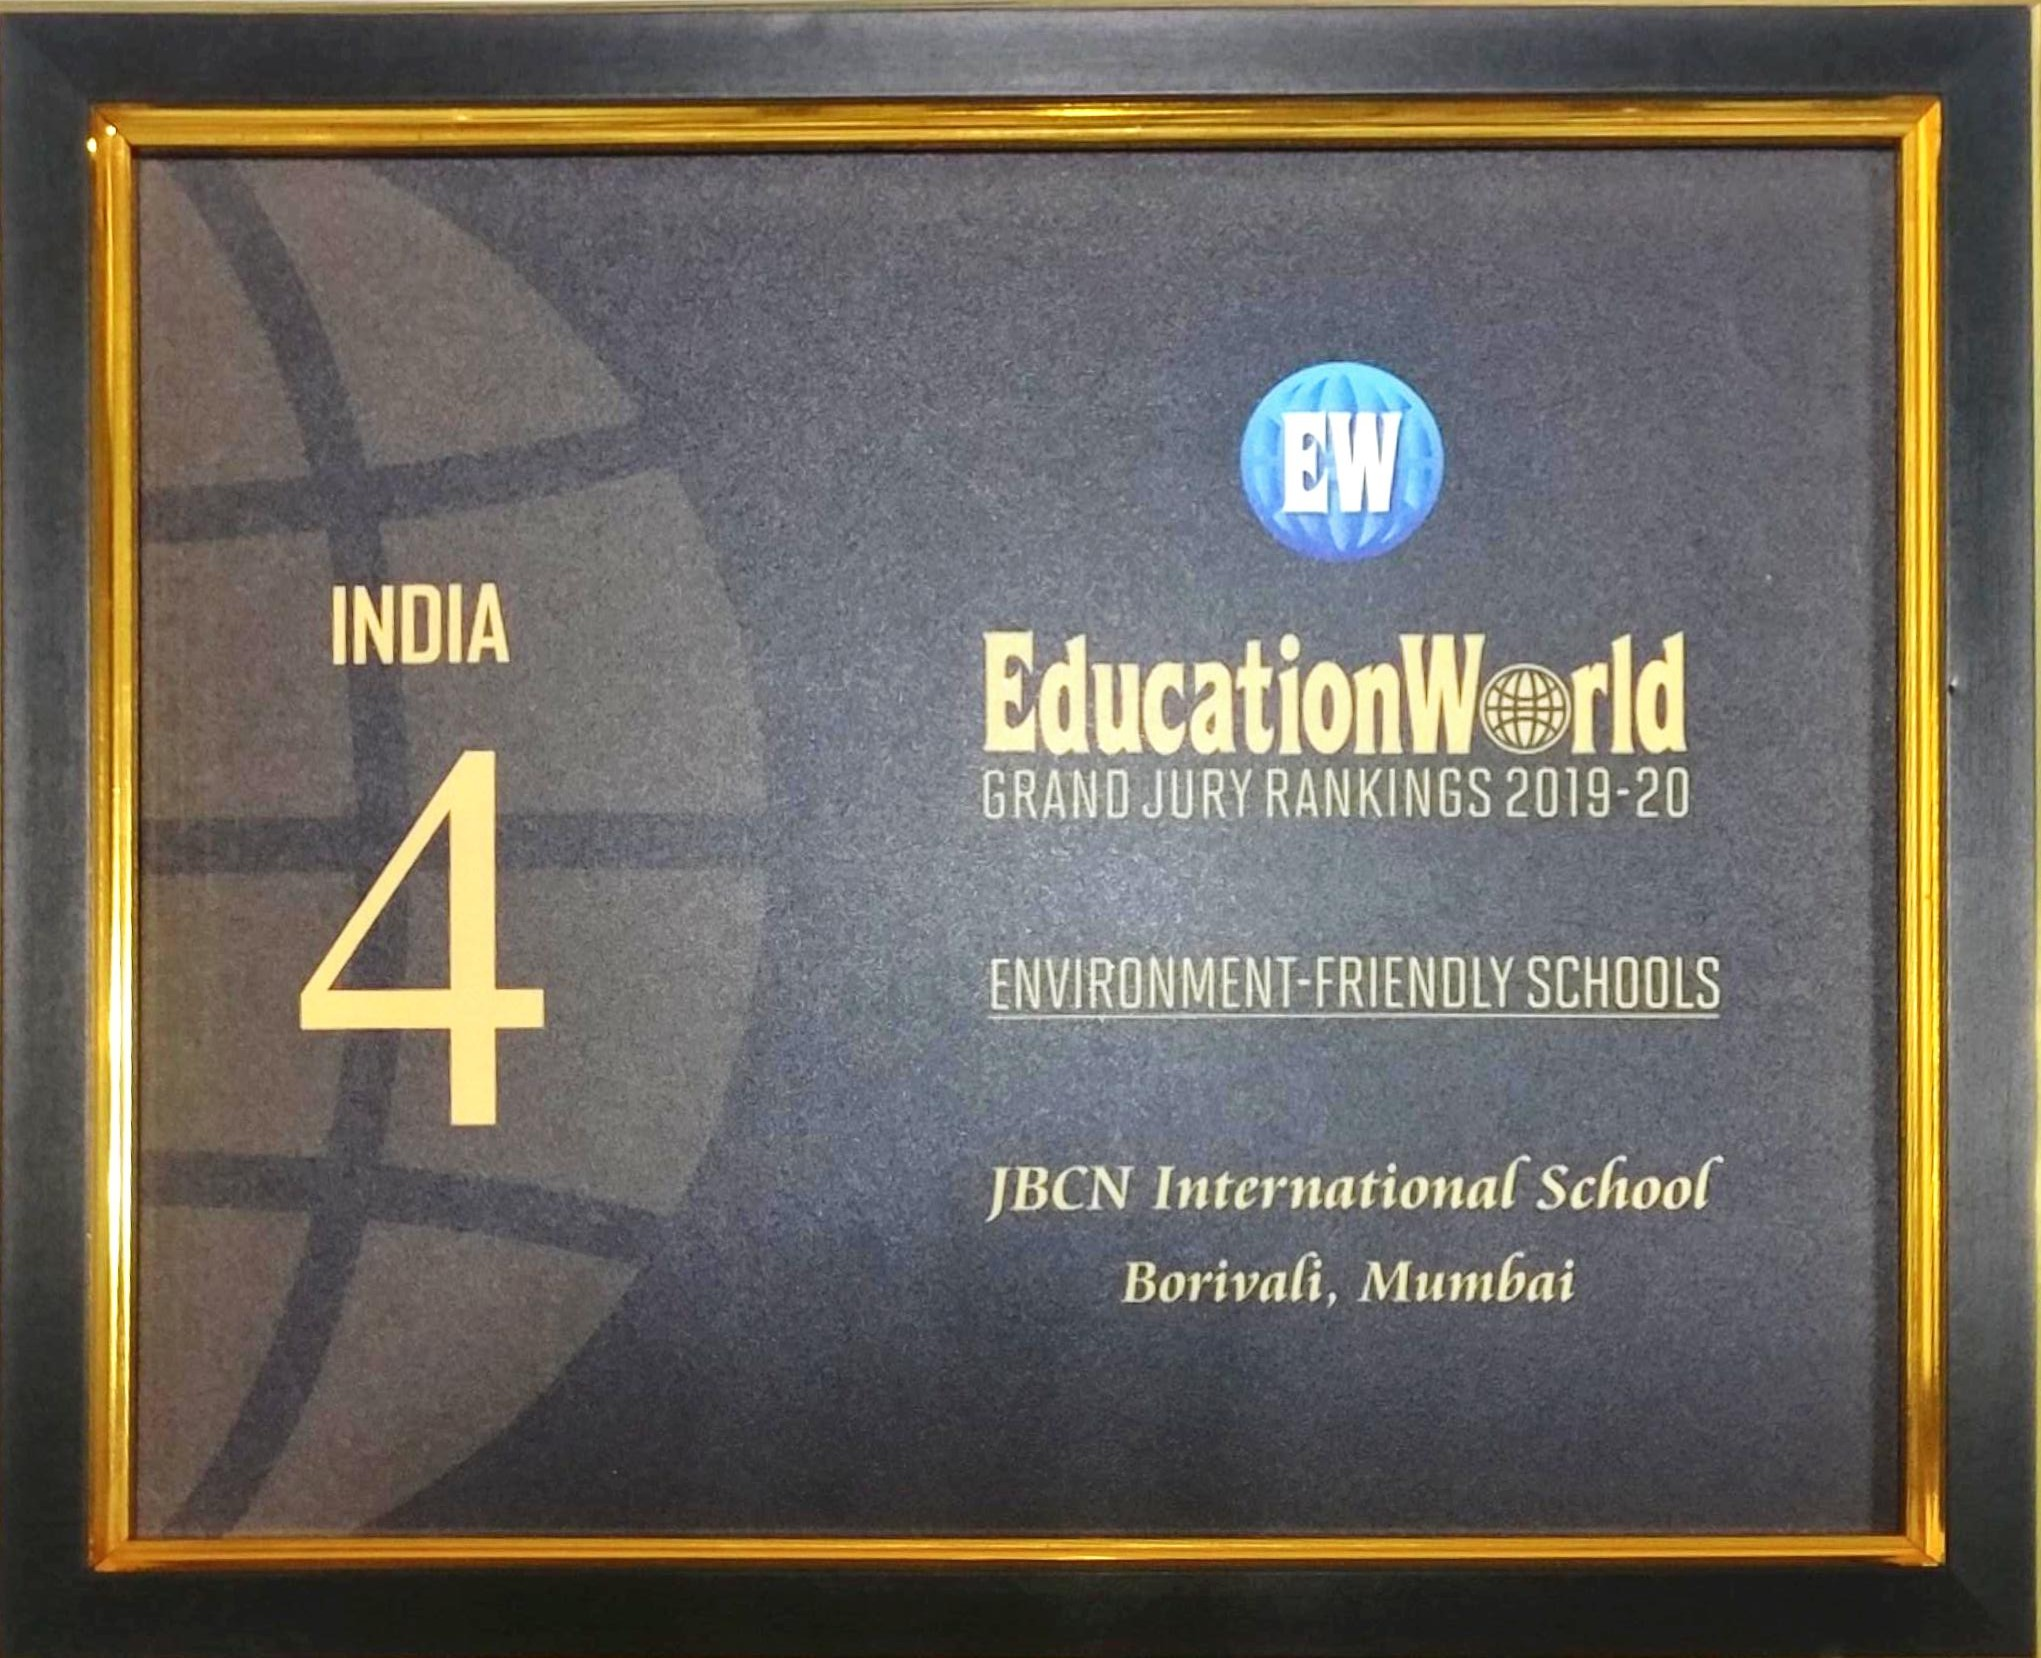 Education World Grand Jury Awards 19